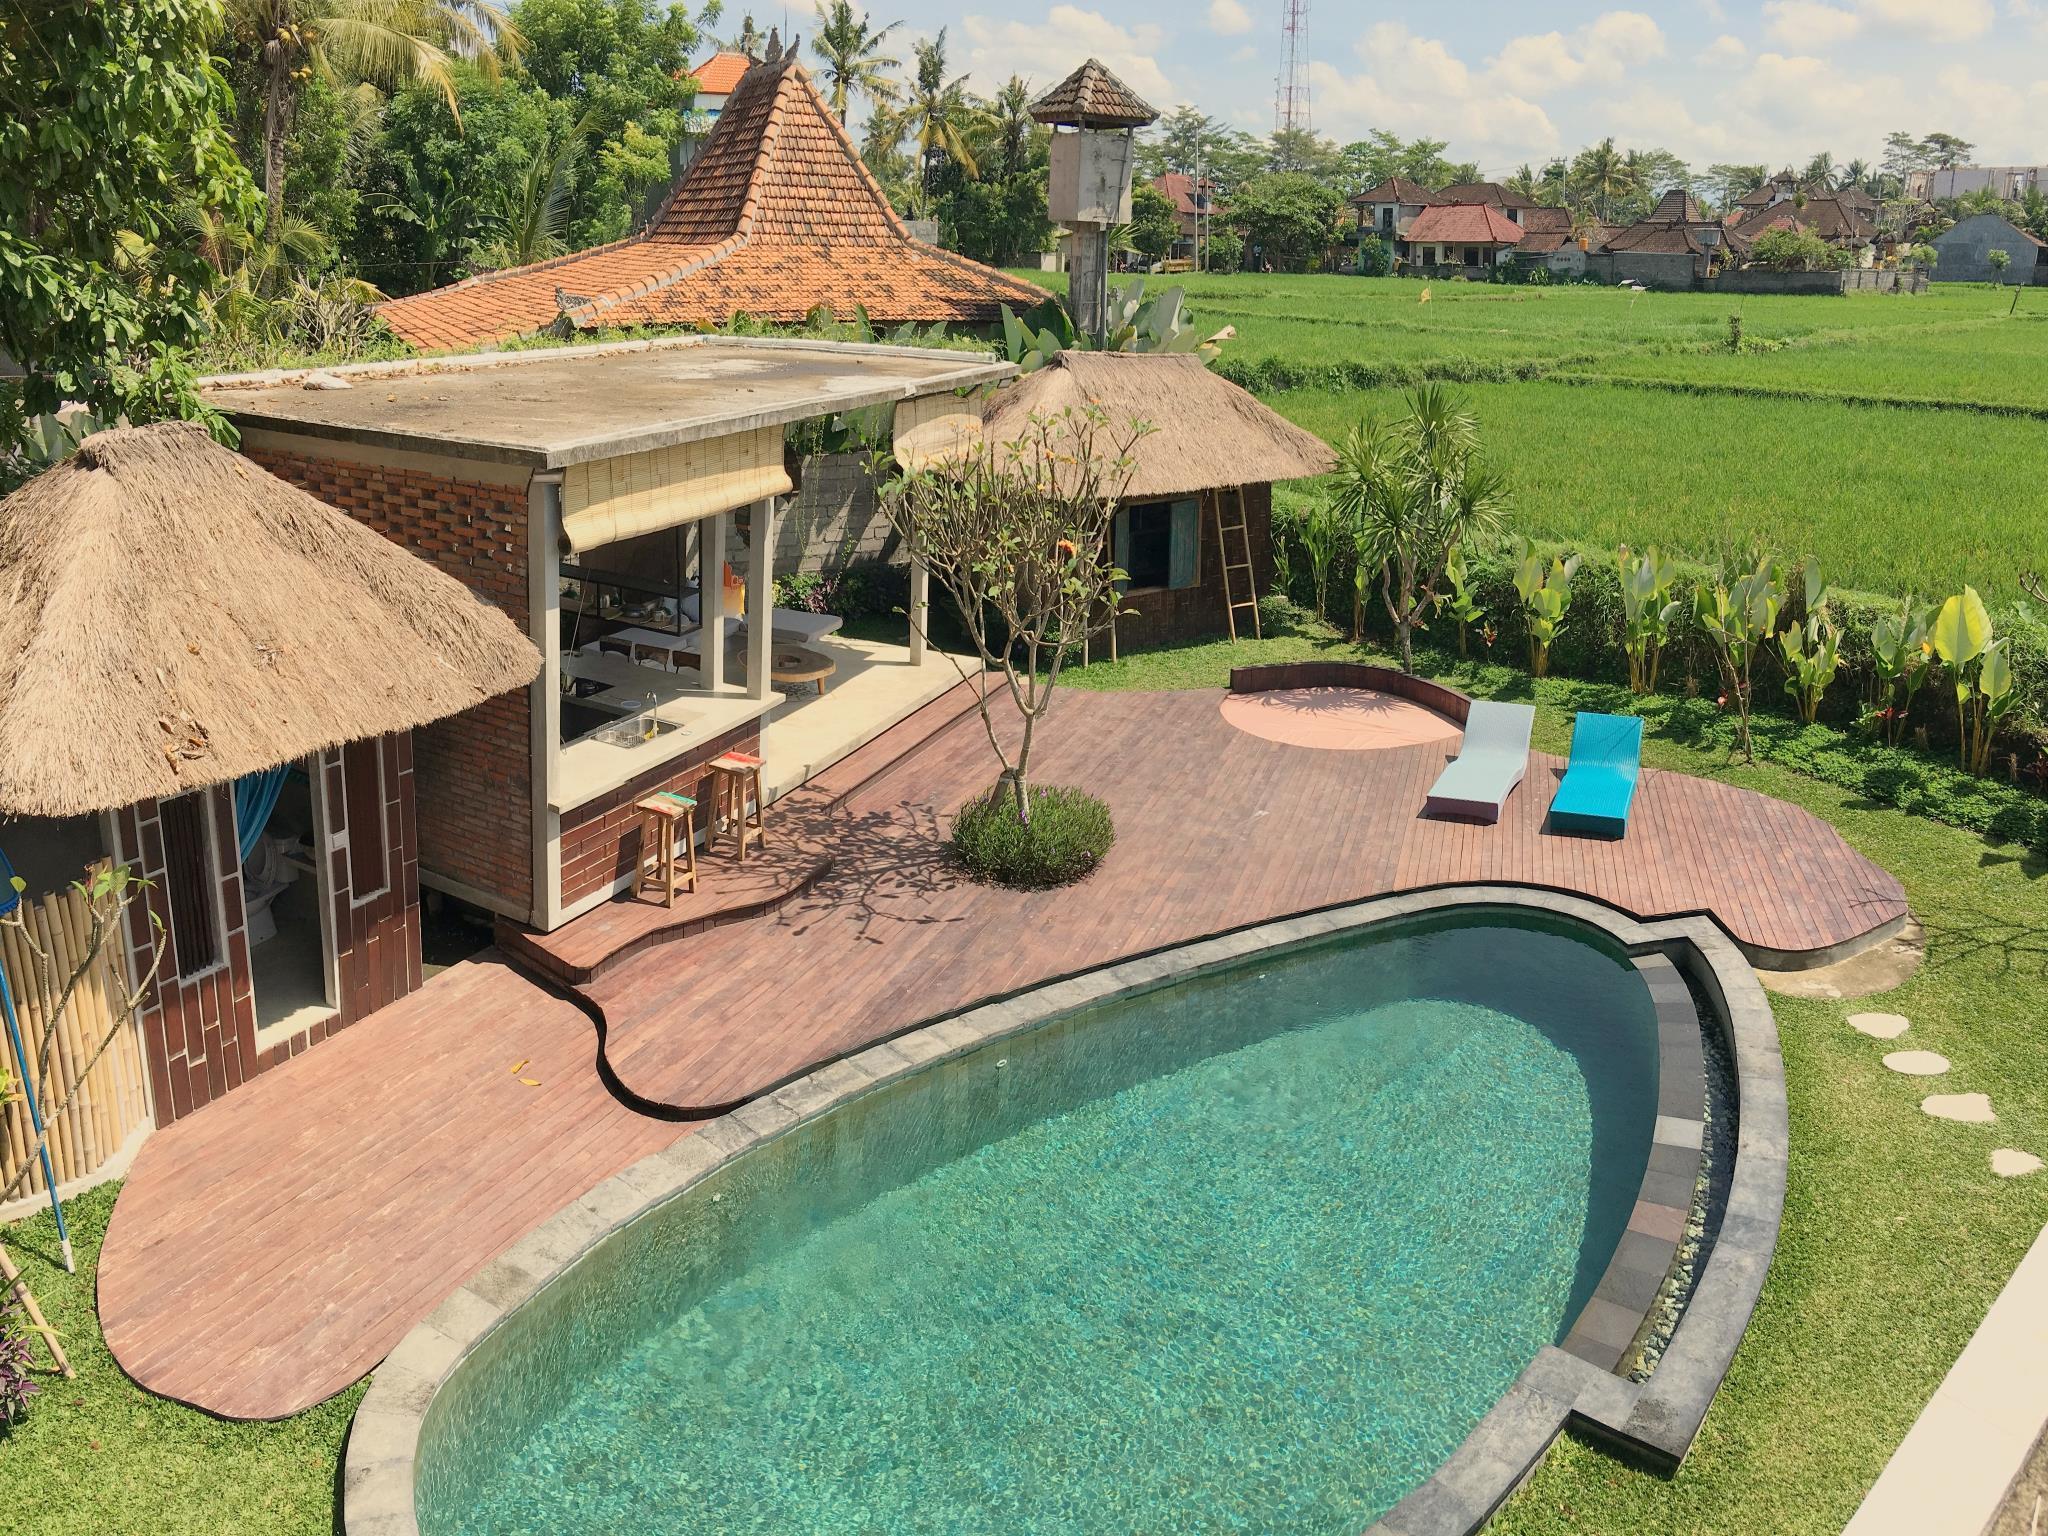 Podpadi A Modern 2 Bedroom Private Villa Hideaway Entire Villa Bali Deals Photos Reviews